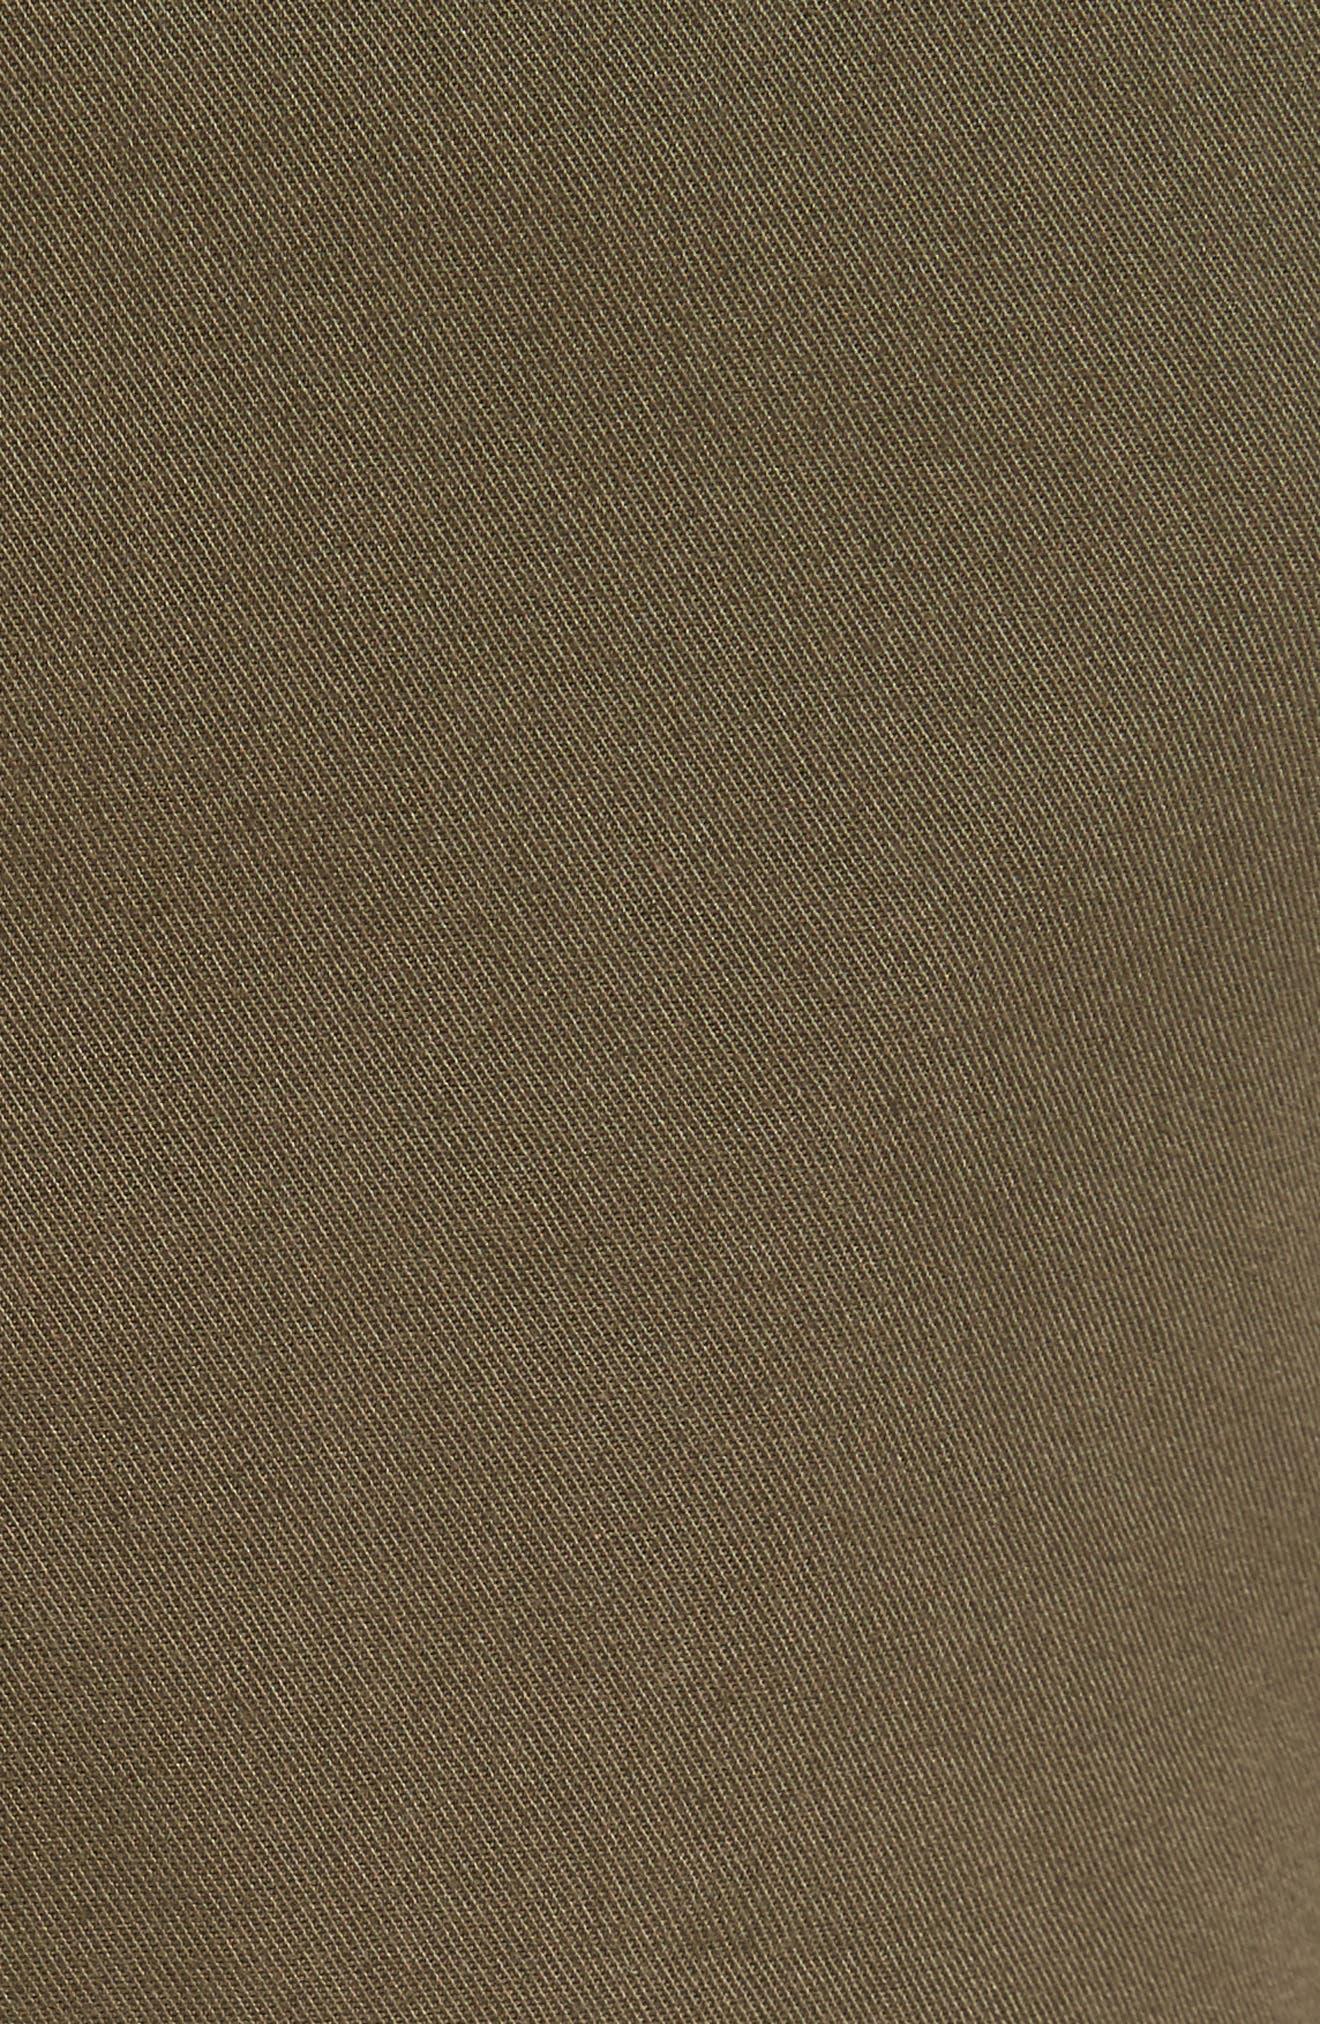 Slim Fit Chino Shorts,                             Alternate thumbnail 5, color,                             Camp Green